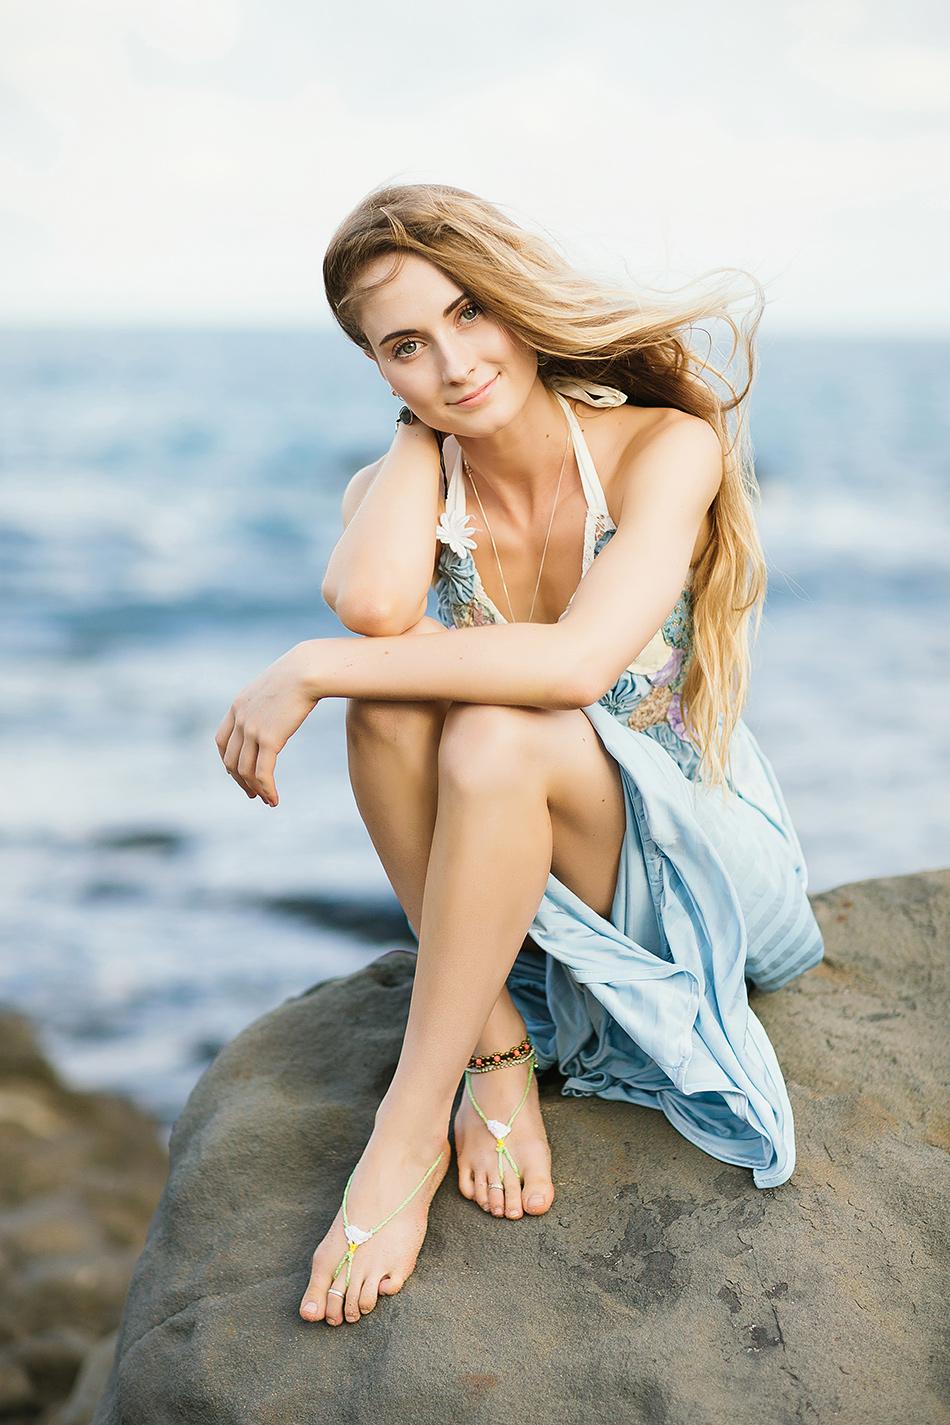 creative portrait photographer byron bay brisbane beach 020